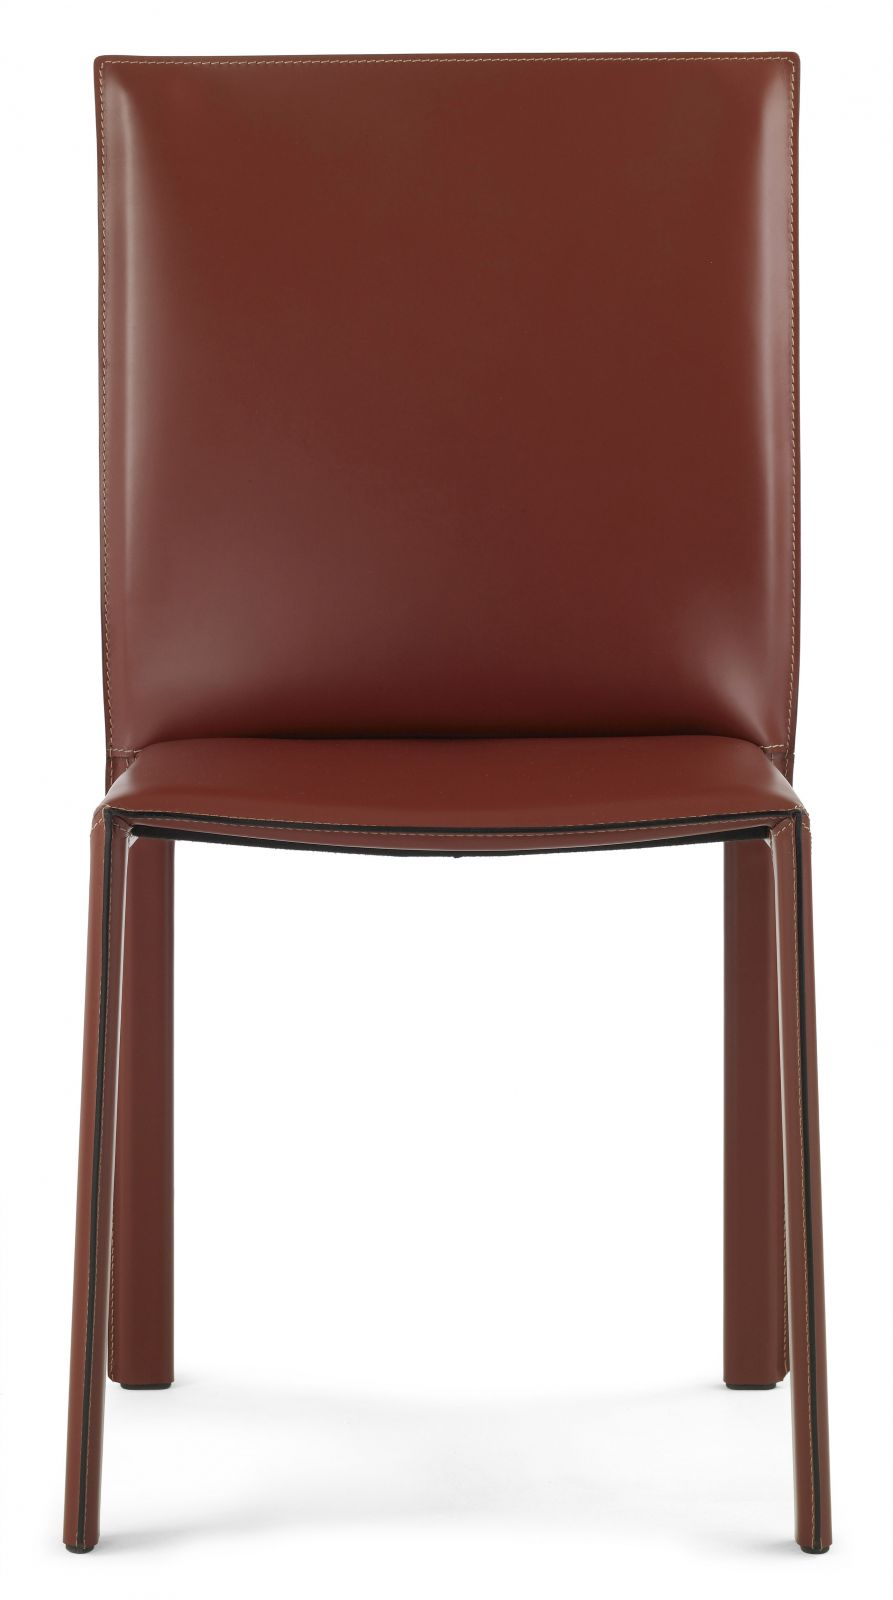 modern-office-furniture-chairs-Italian-designer-furniture (33).jpg